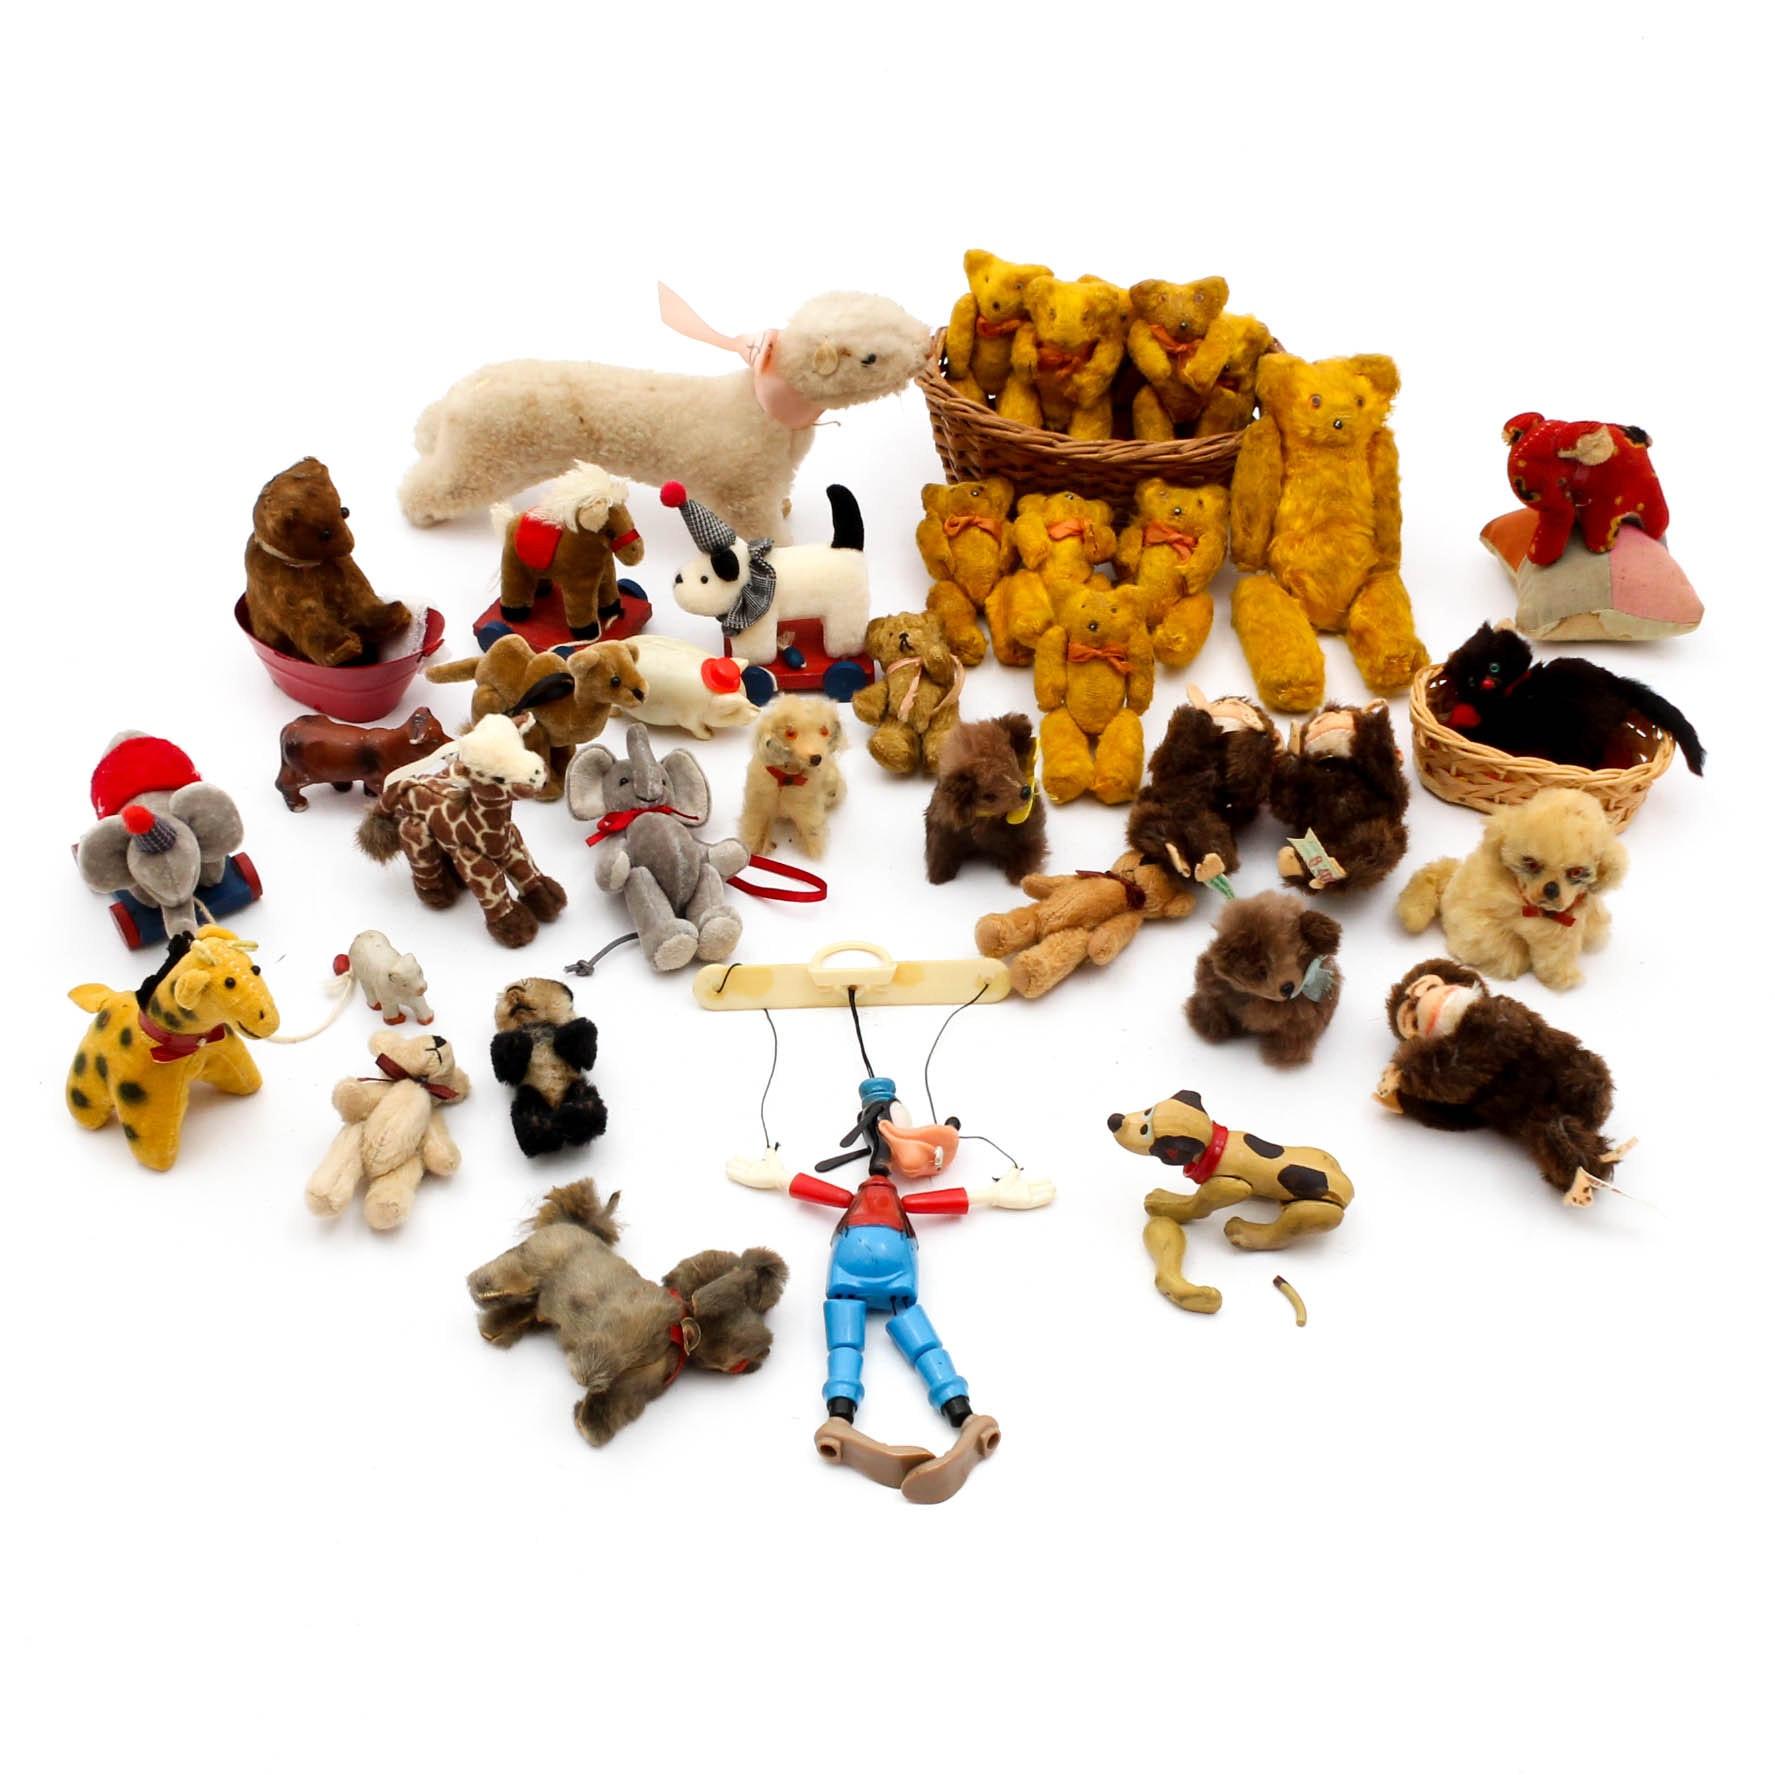 Vintage Miniature Plush Toys